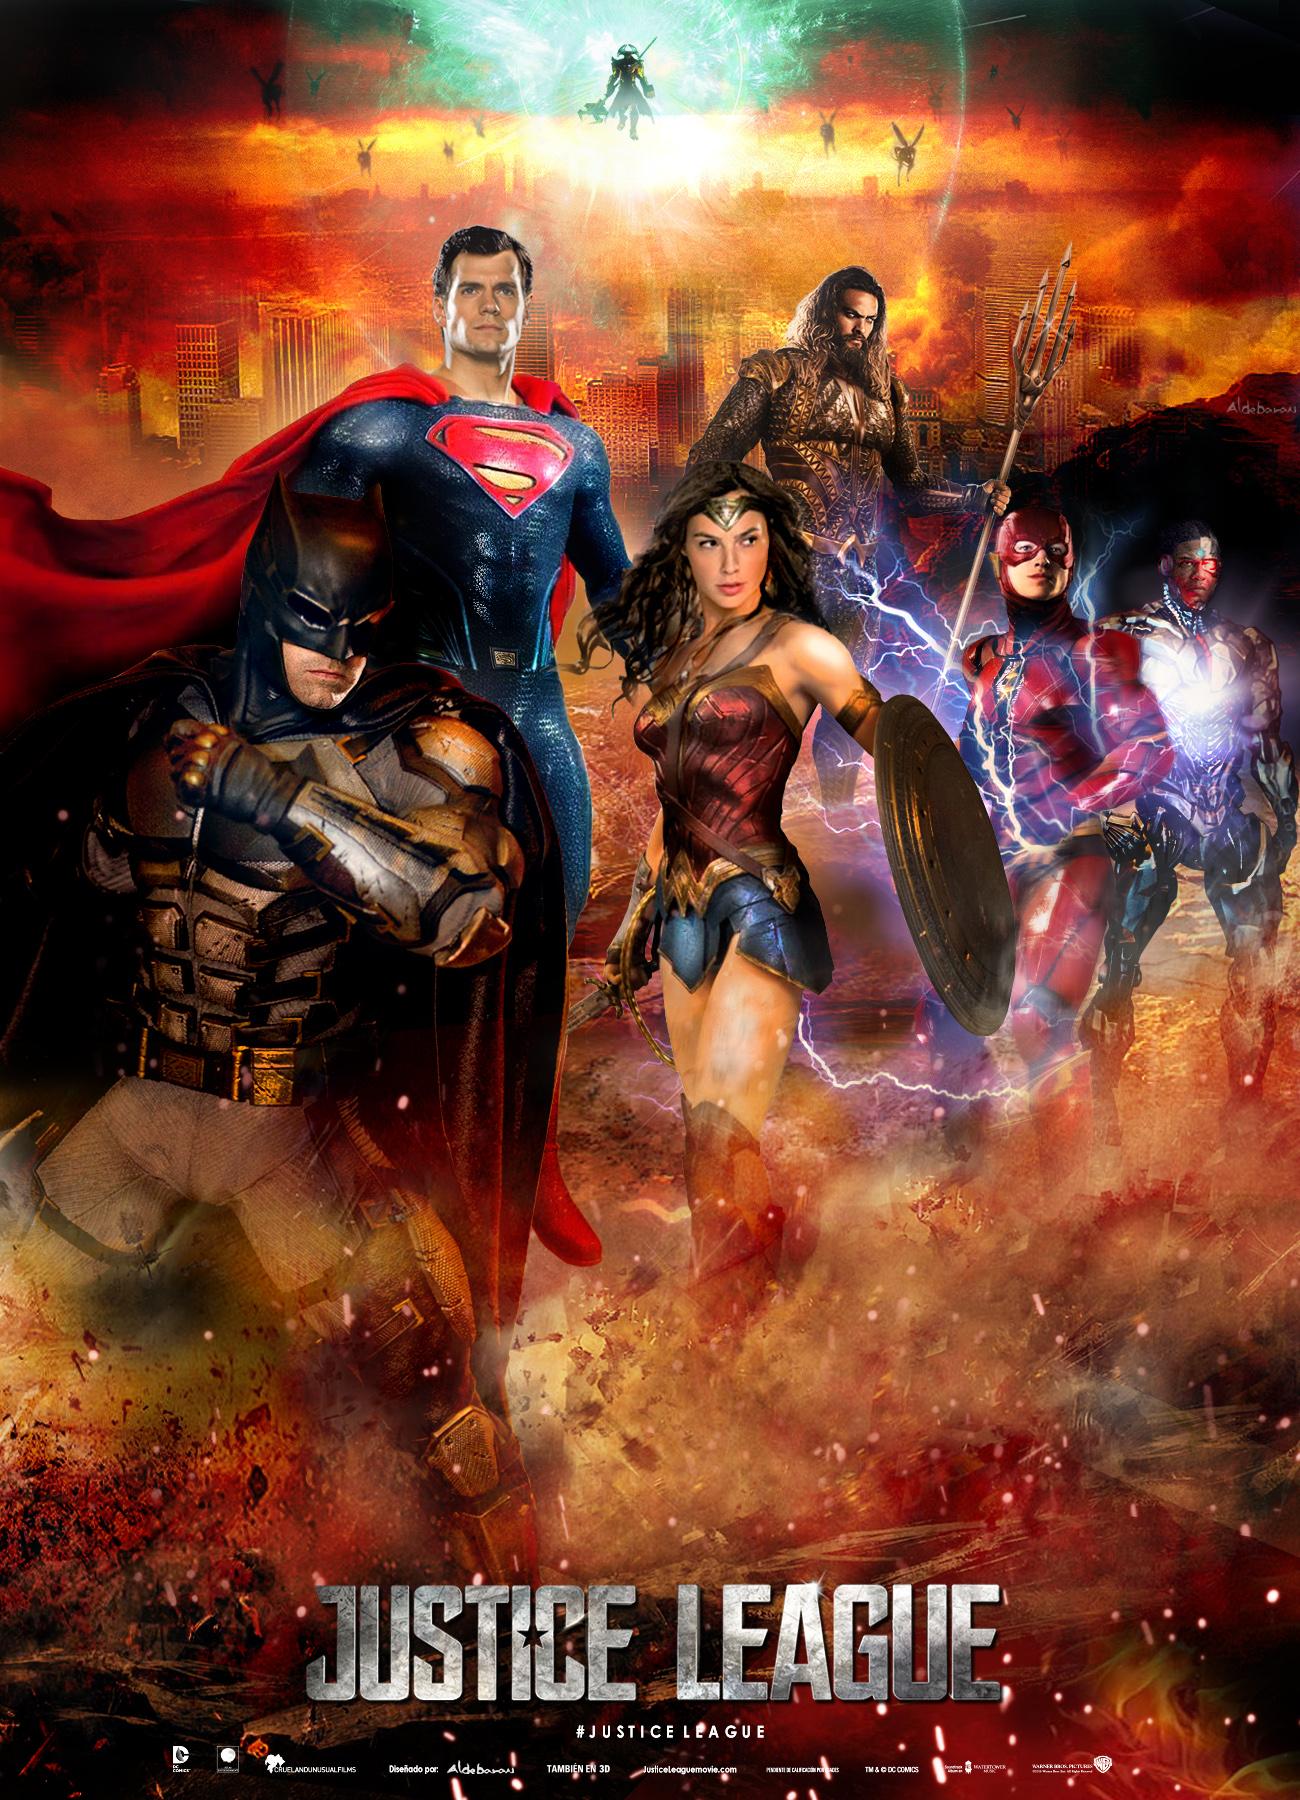 Justice League Movie Poster 3 by SaintAldebaran on DeviantArt